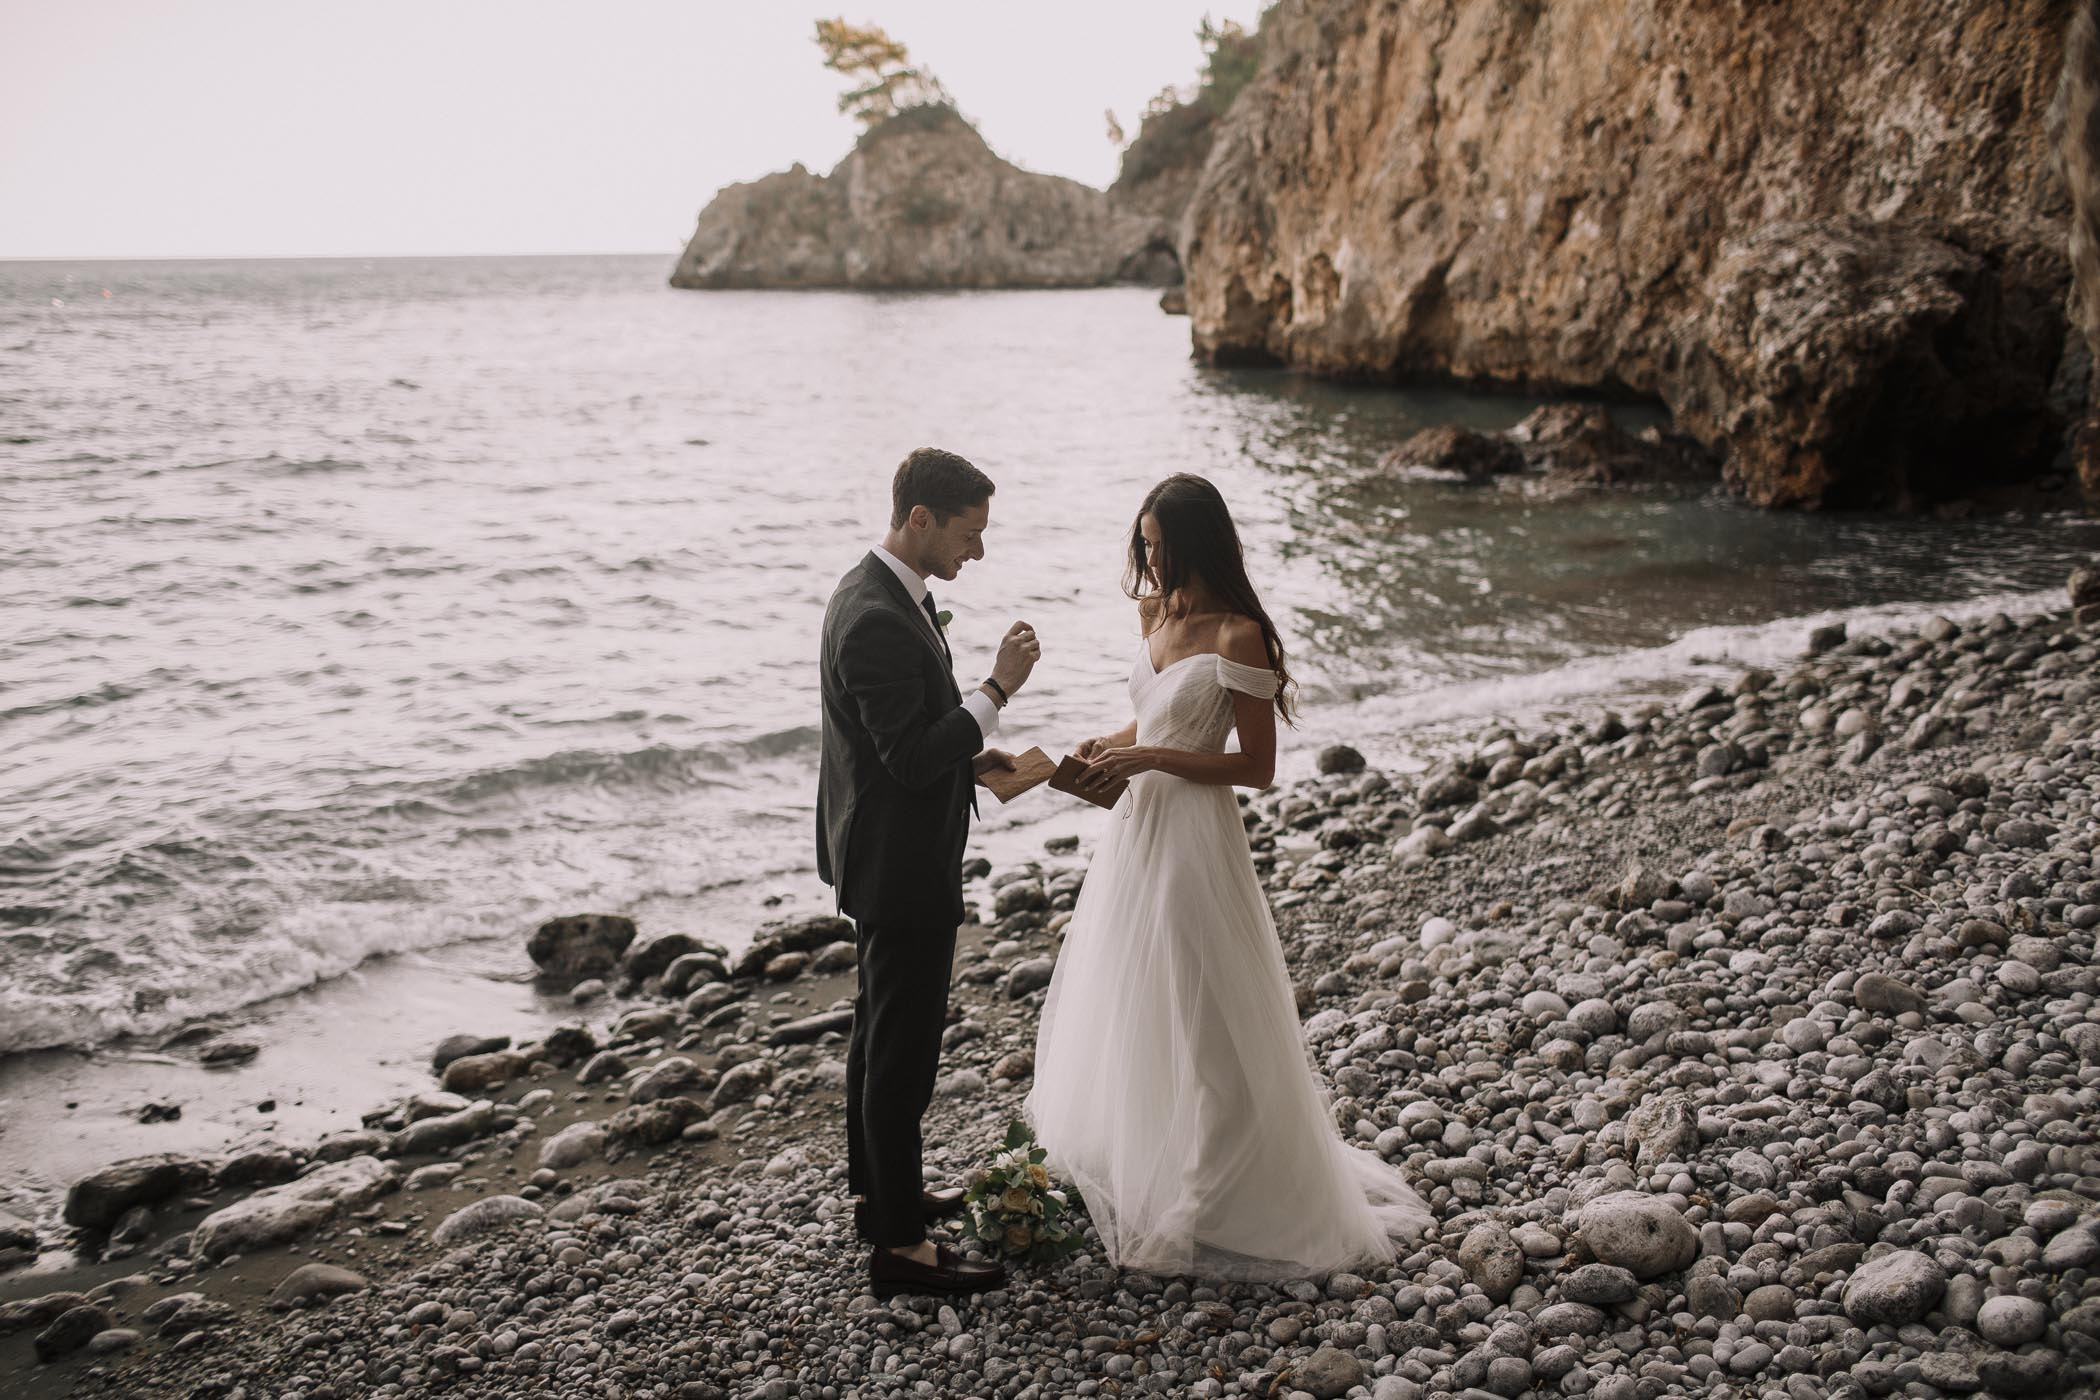 Photographe-mariage-bordeaux-jeremy-boyer-16.jpg